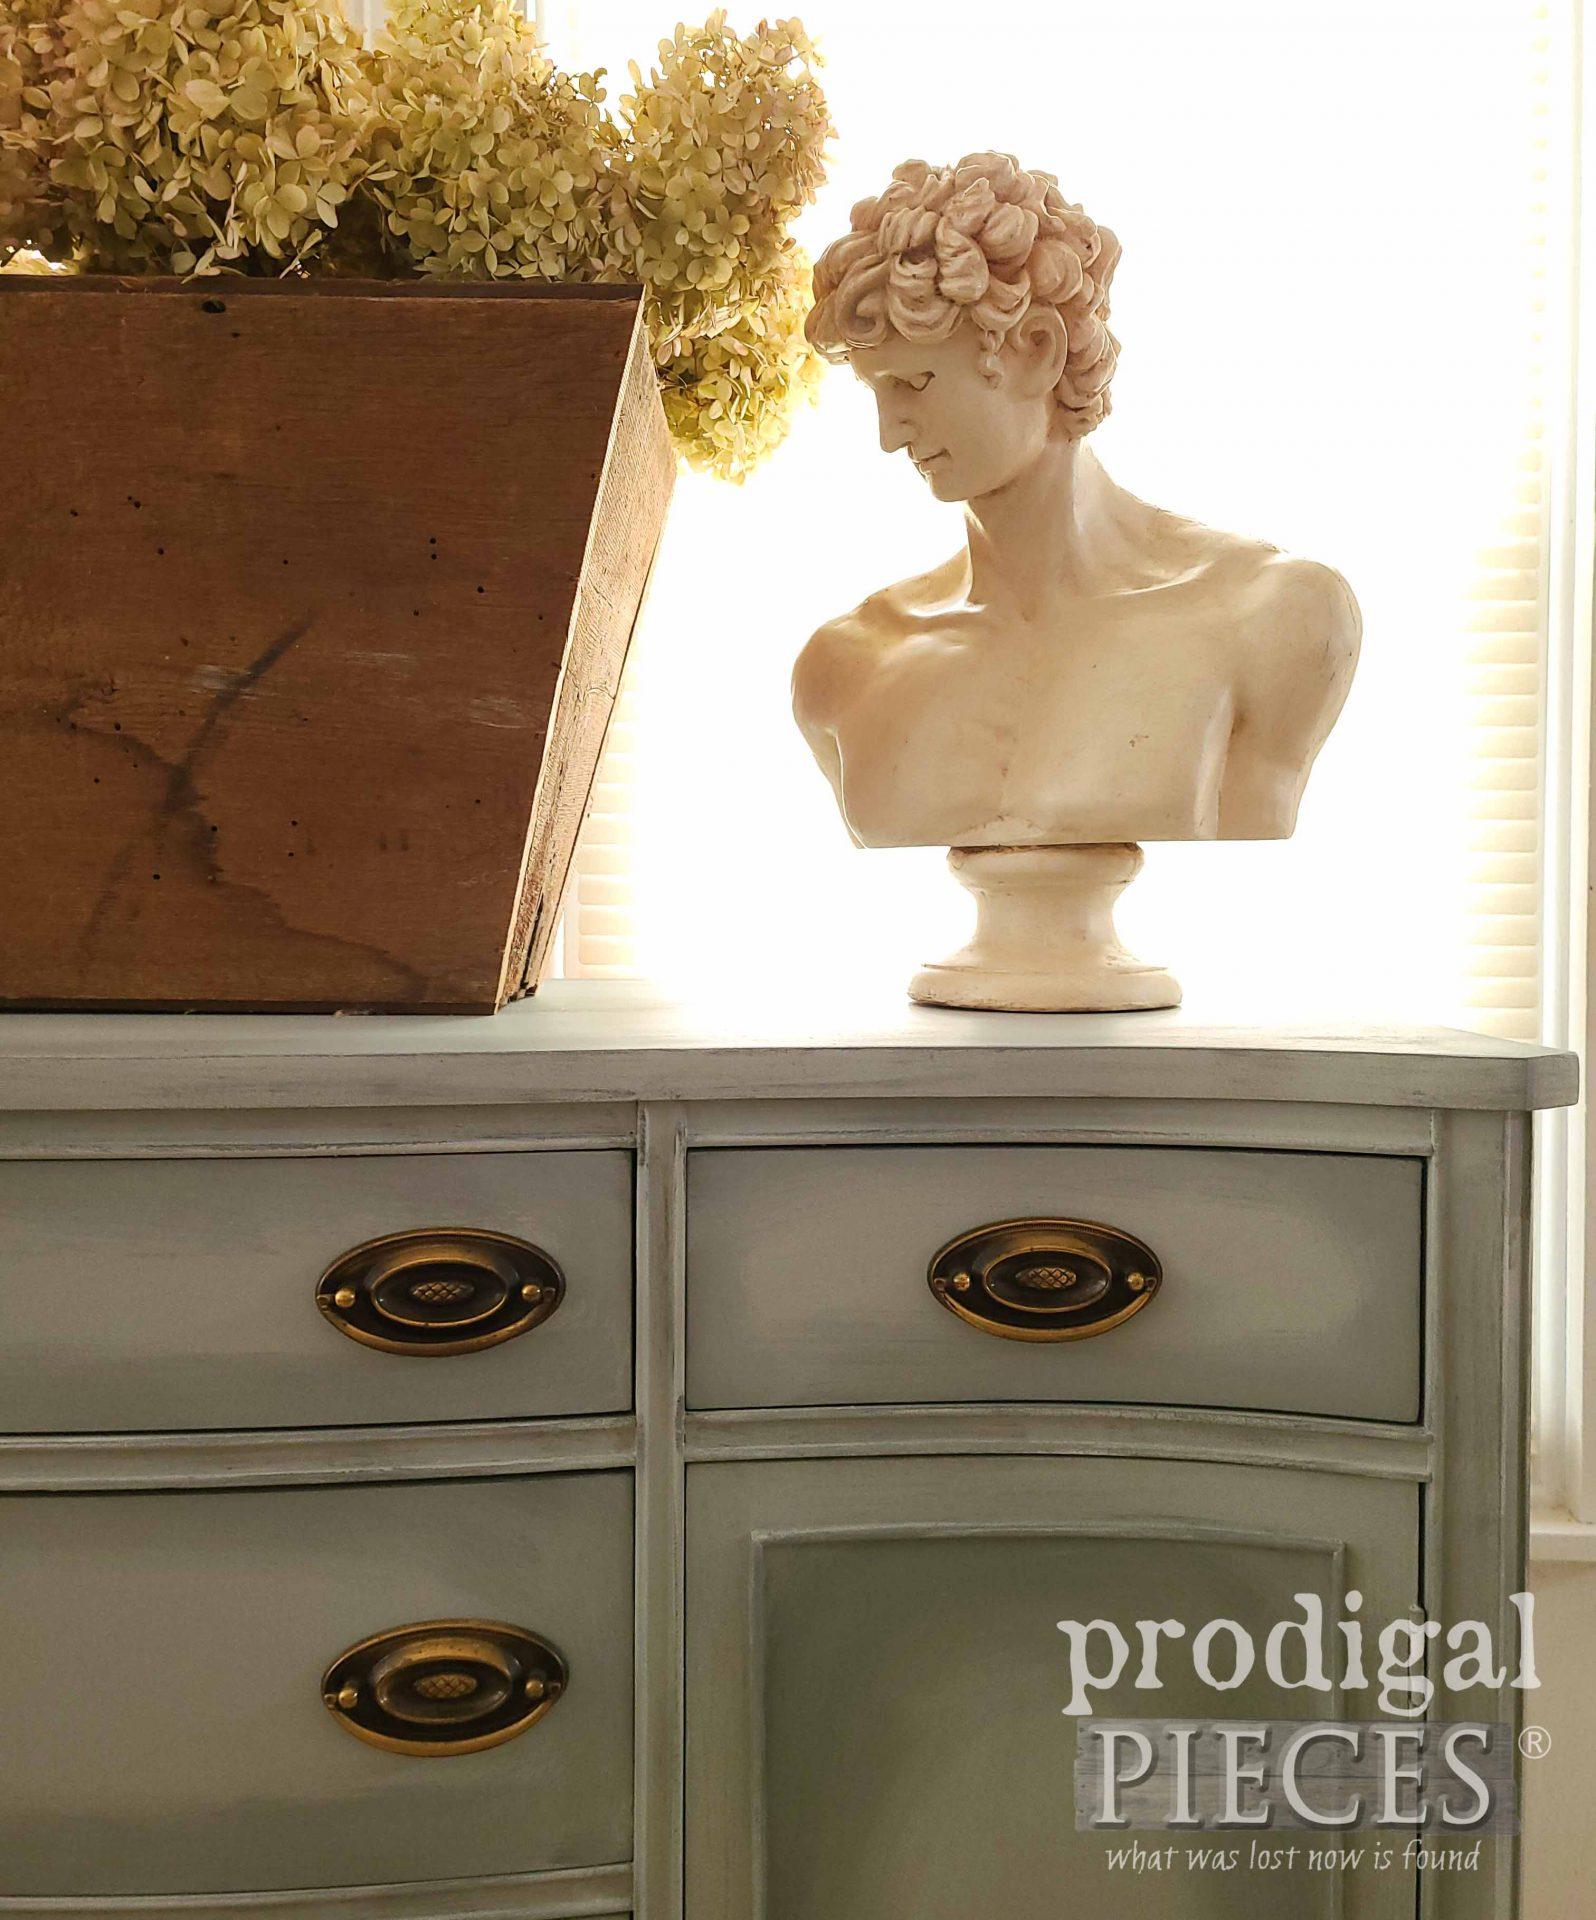 Corner Buffet Styling by Larissa of Prodigal Pieces | prodigalpieces.com #prodigalpieces #farmhouse #diy #home #homedecor